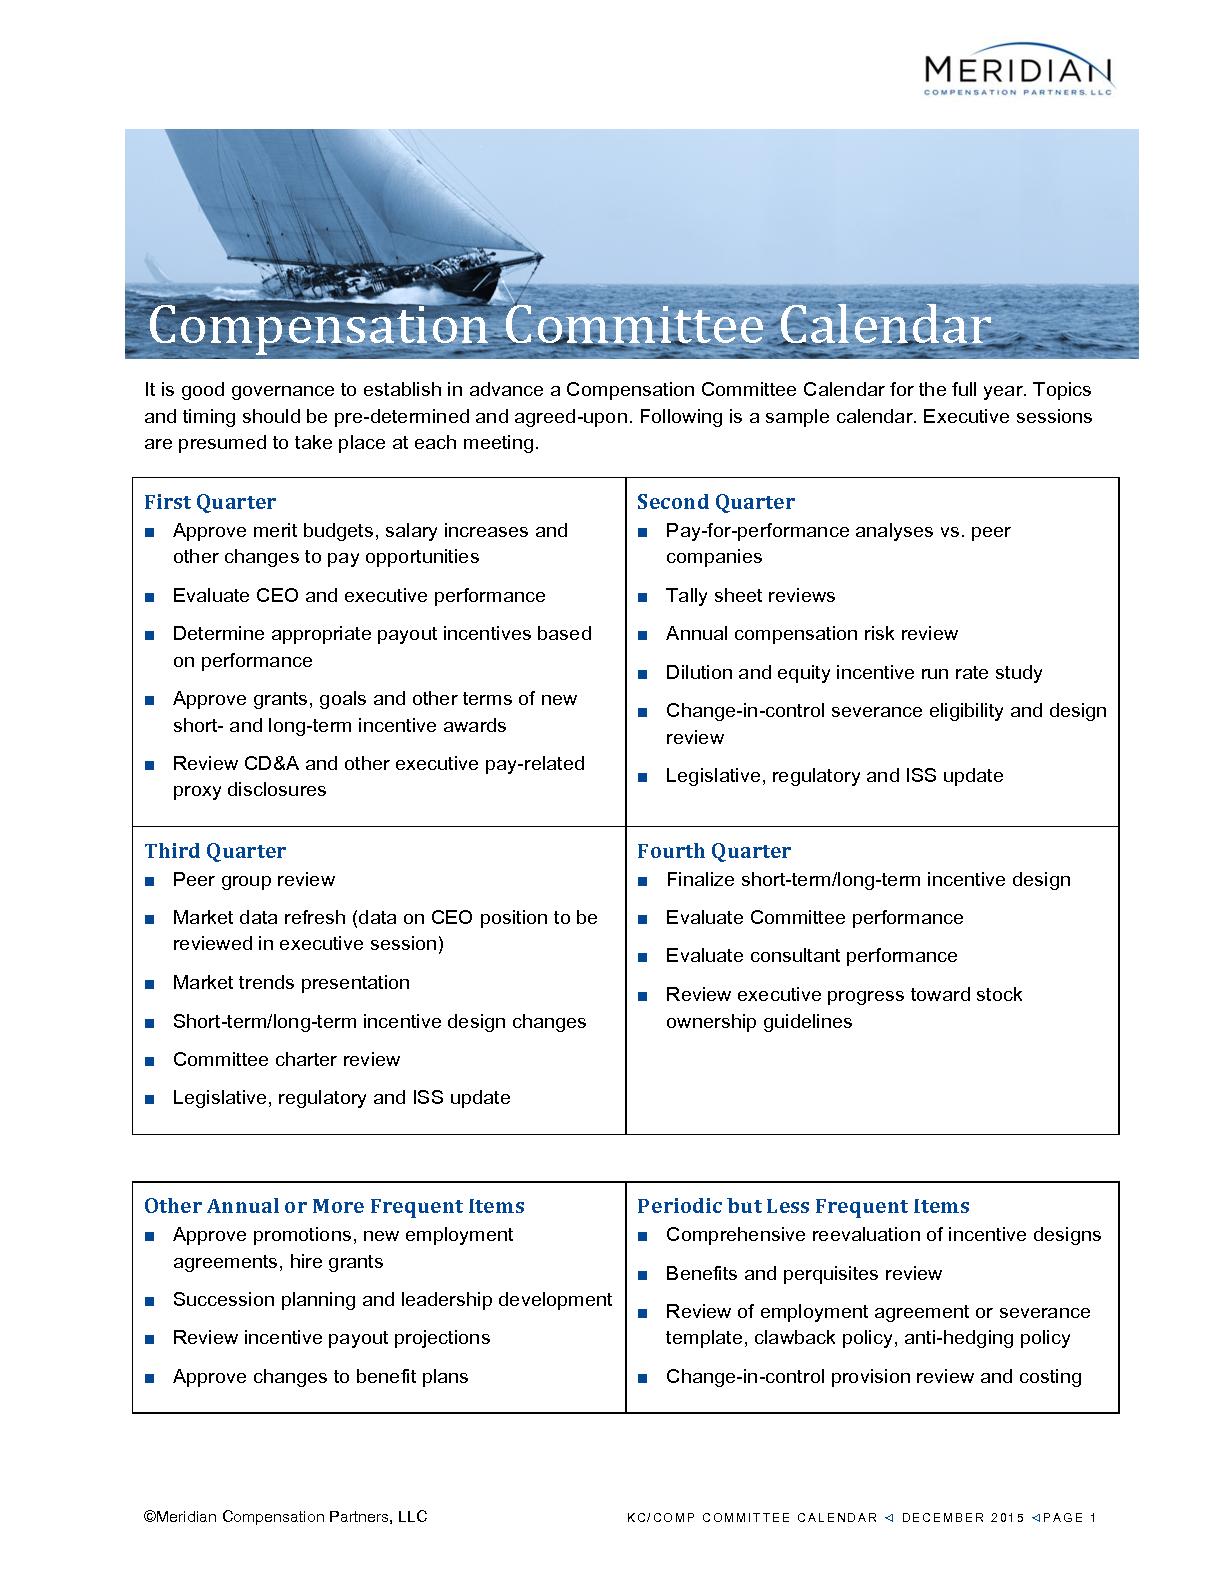 Compensation Committee Calendar (PDF)